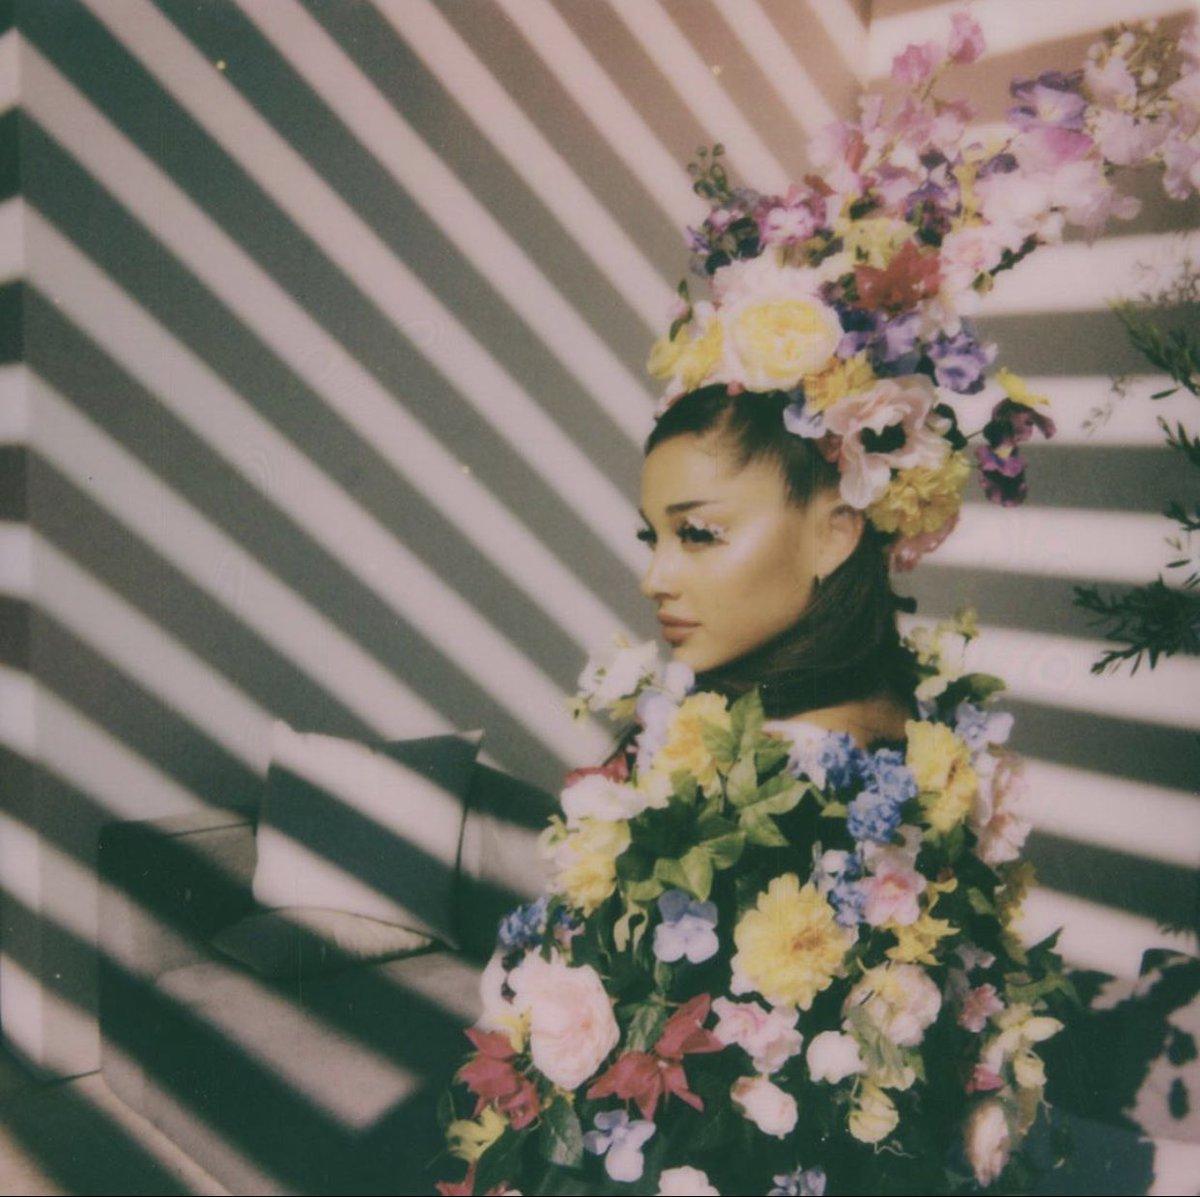 midsommar birthday queen 📸 #ag27